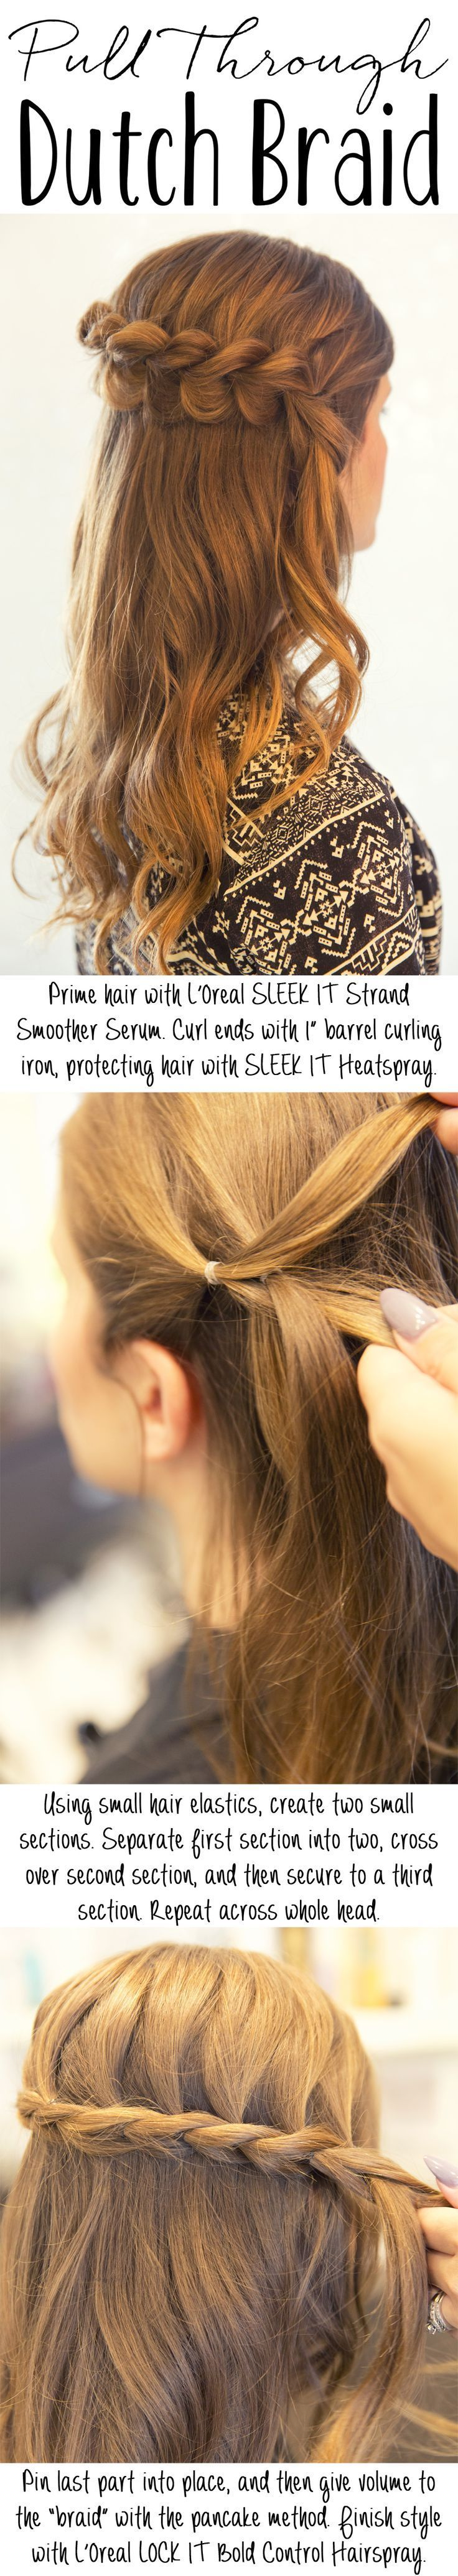 Awesome hair tutorial naturalskincare healthyskin